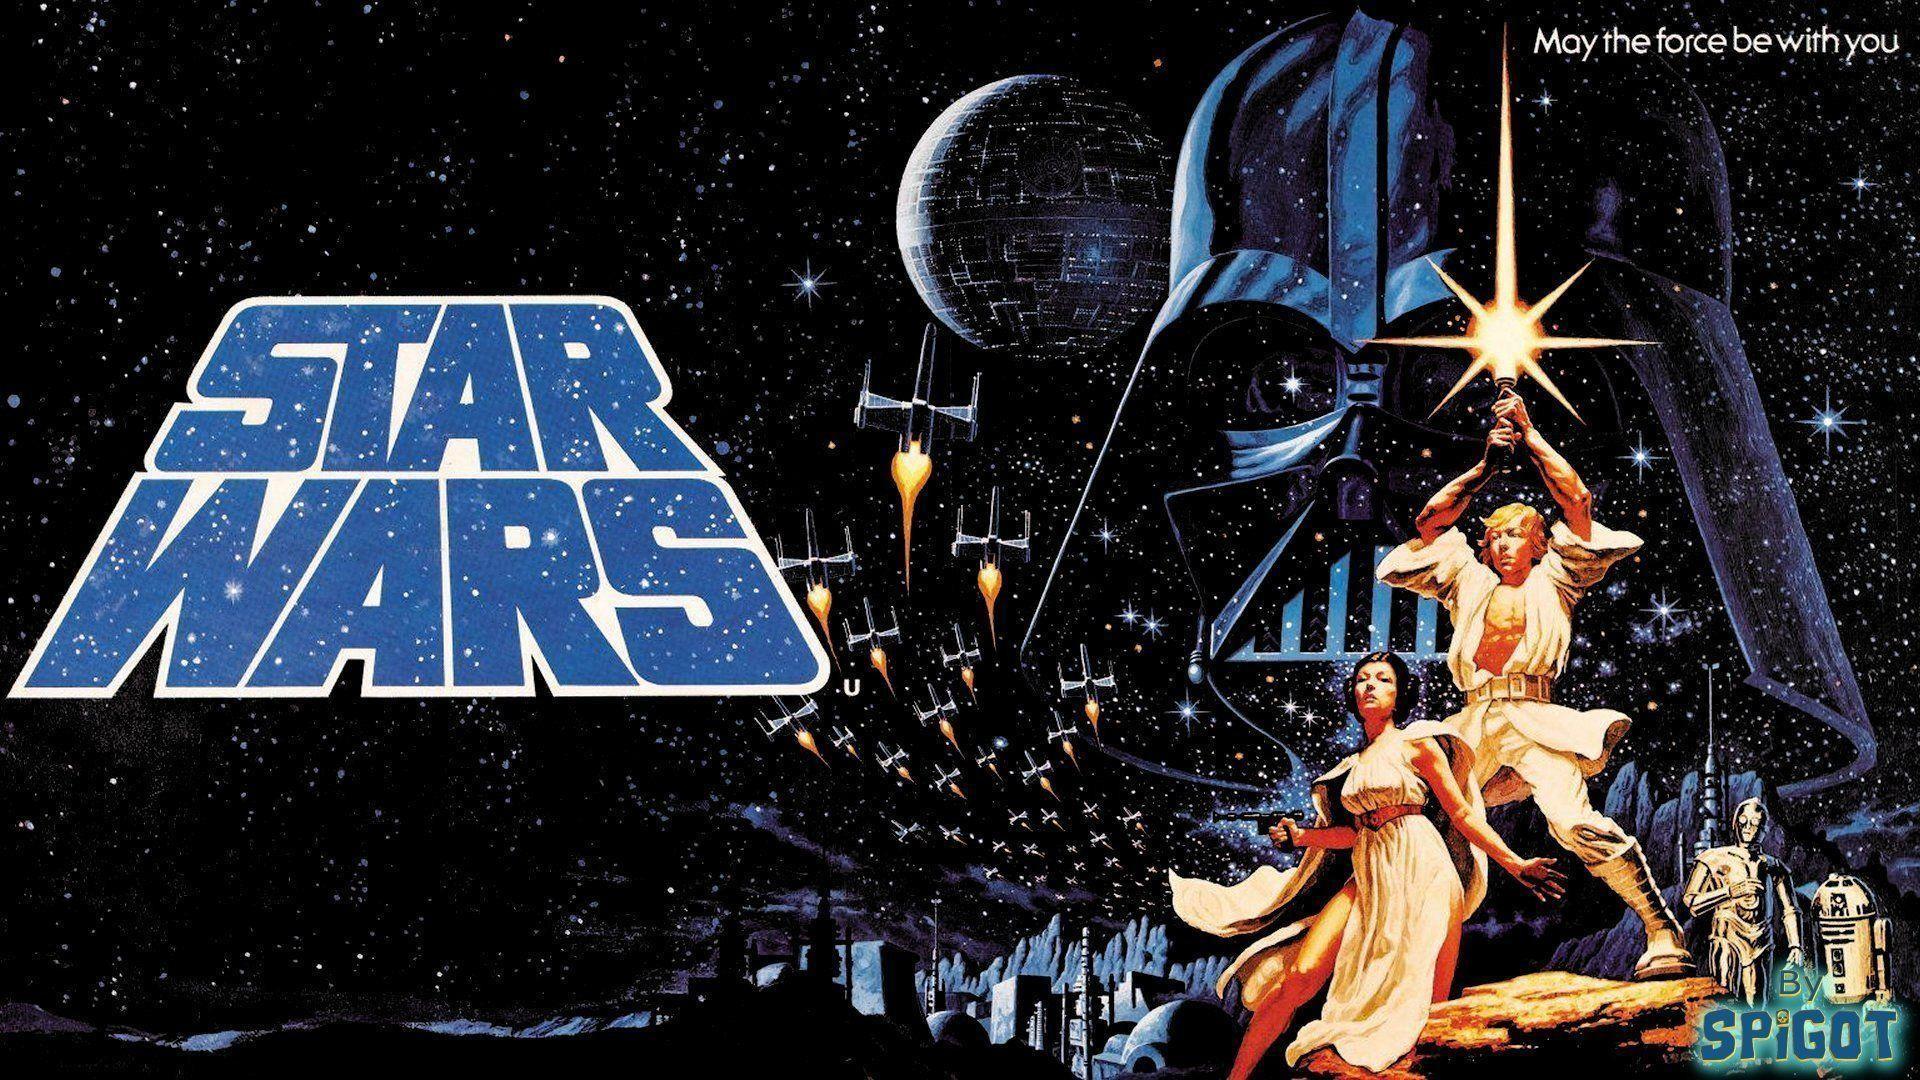 Star Wars Wallpaper 69 Images